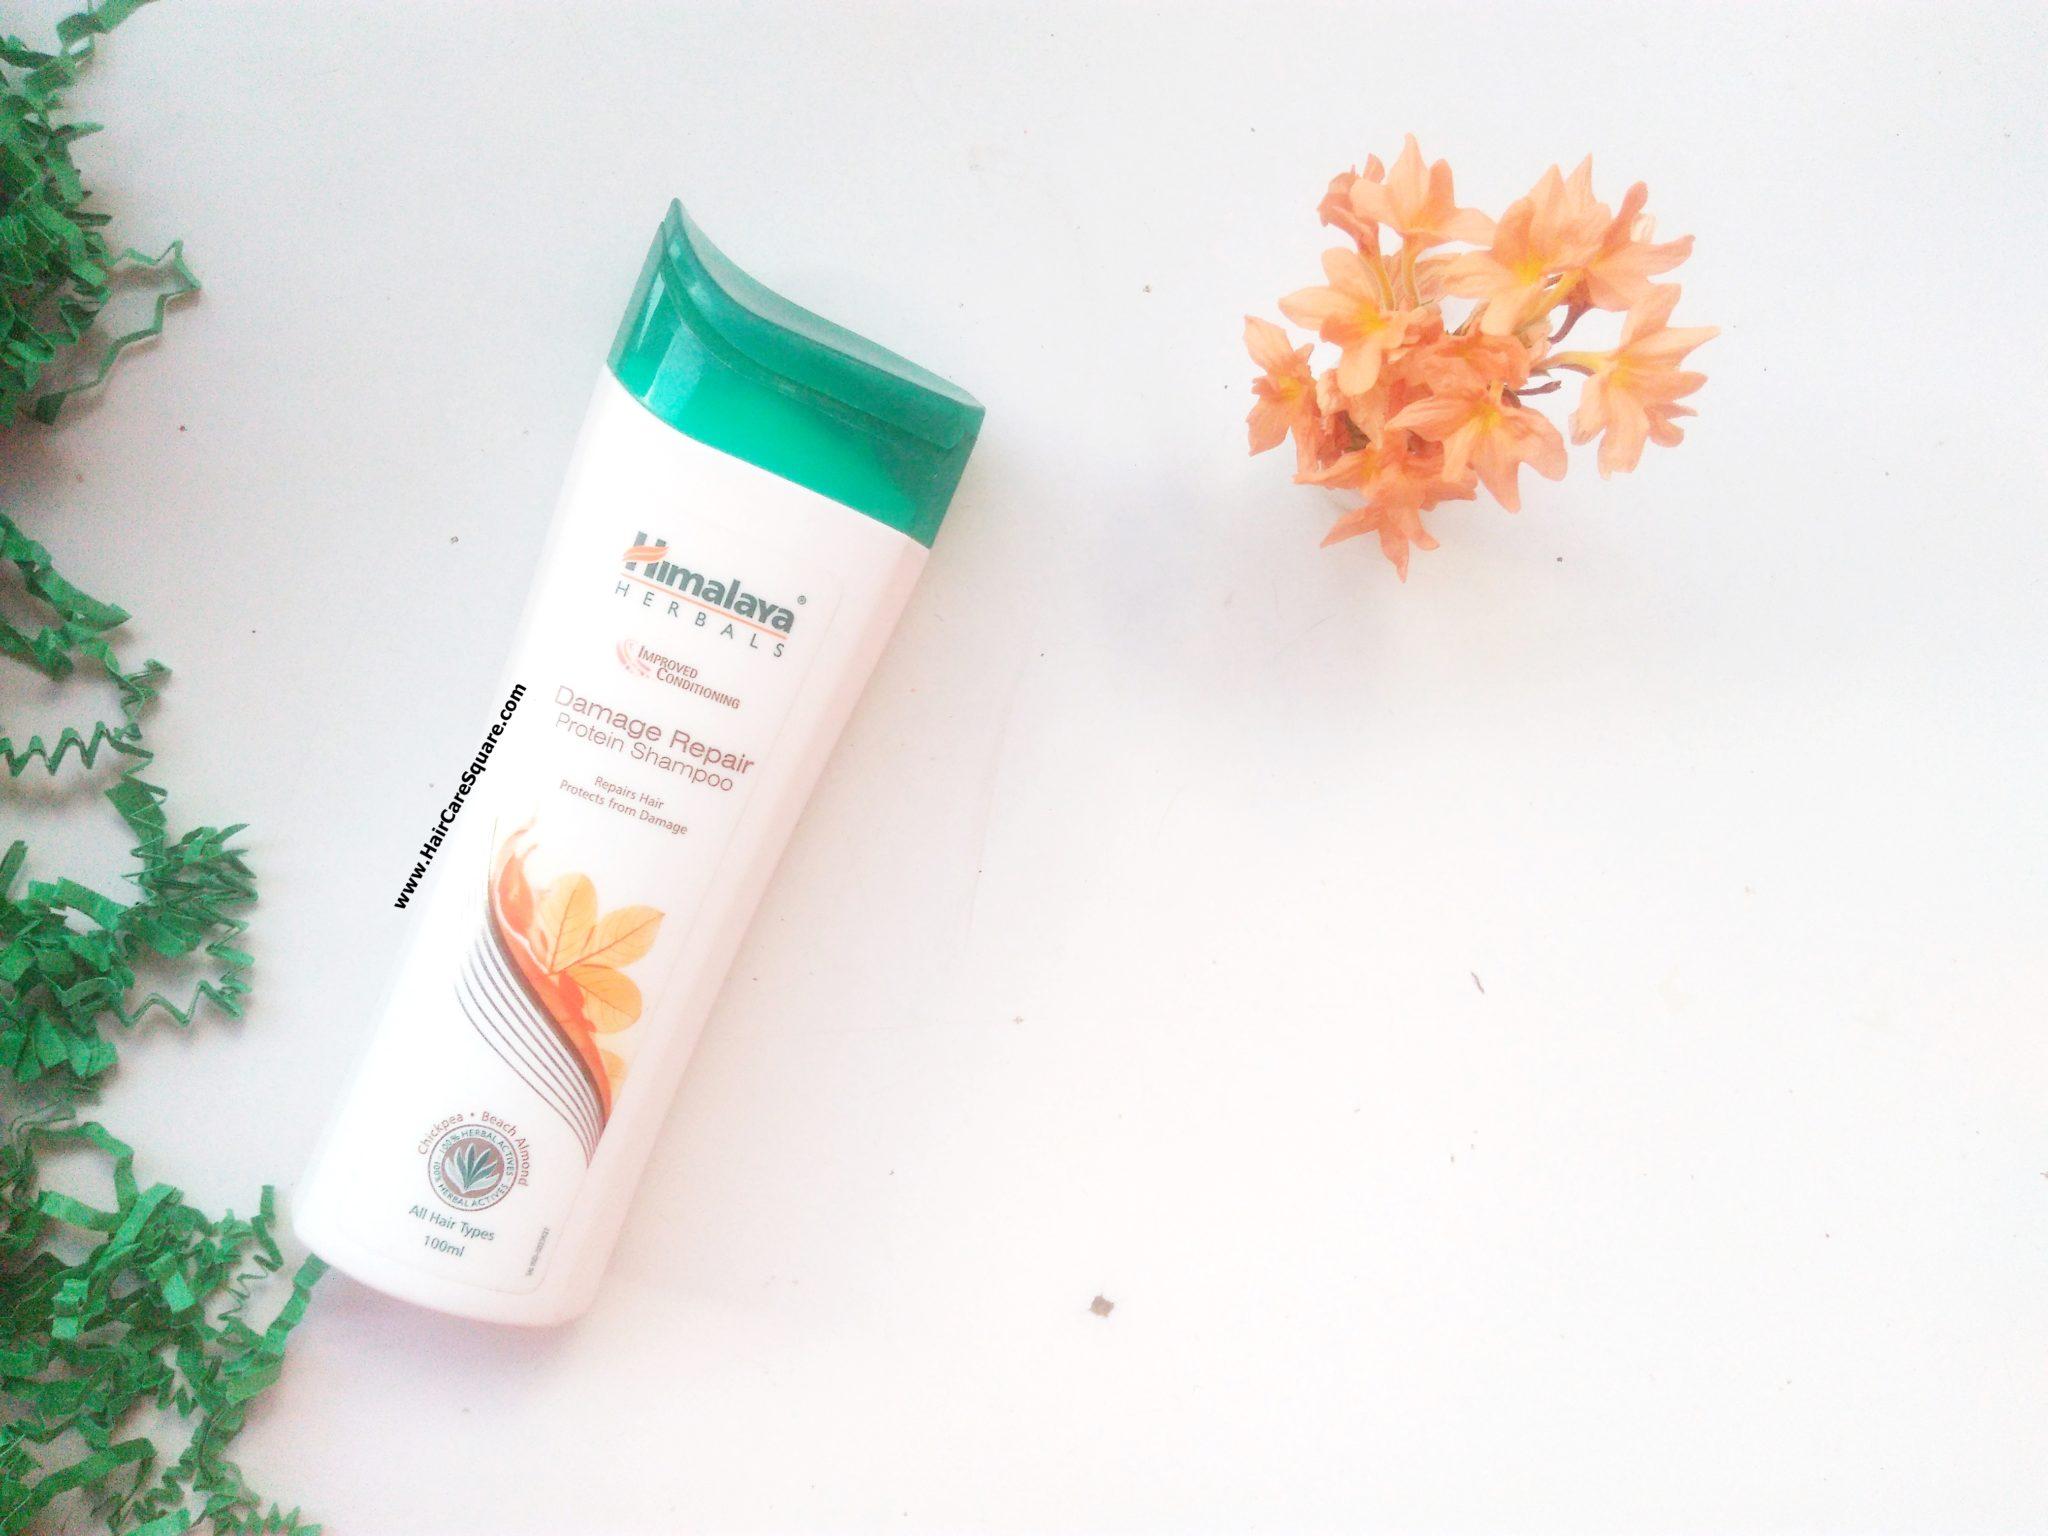 Himalaya Damage Repair Protein Shampoo